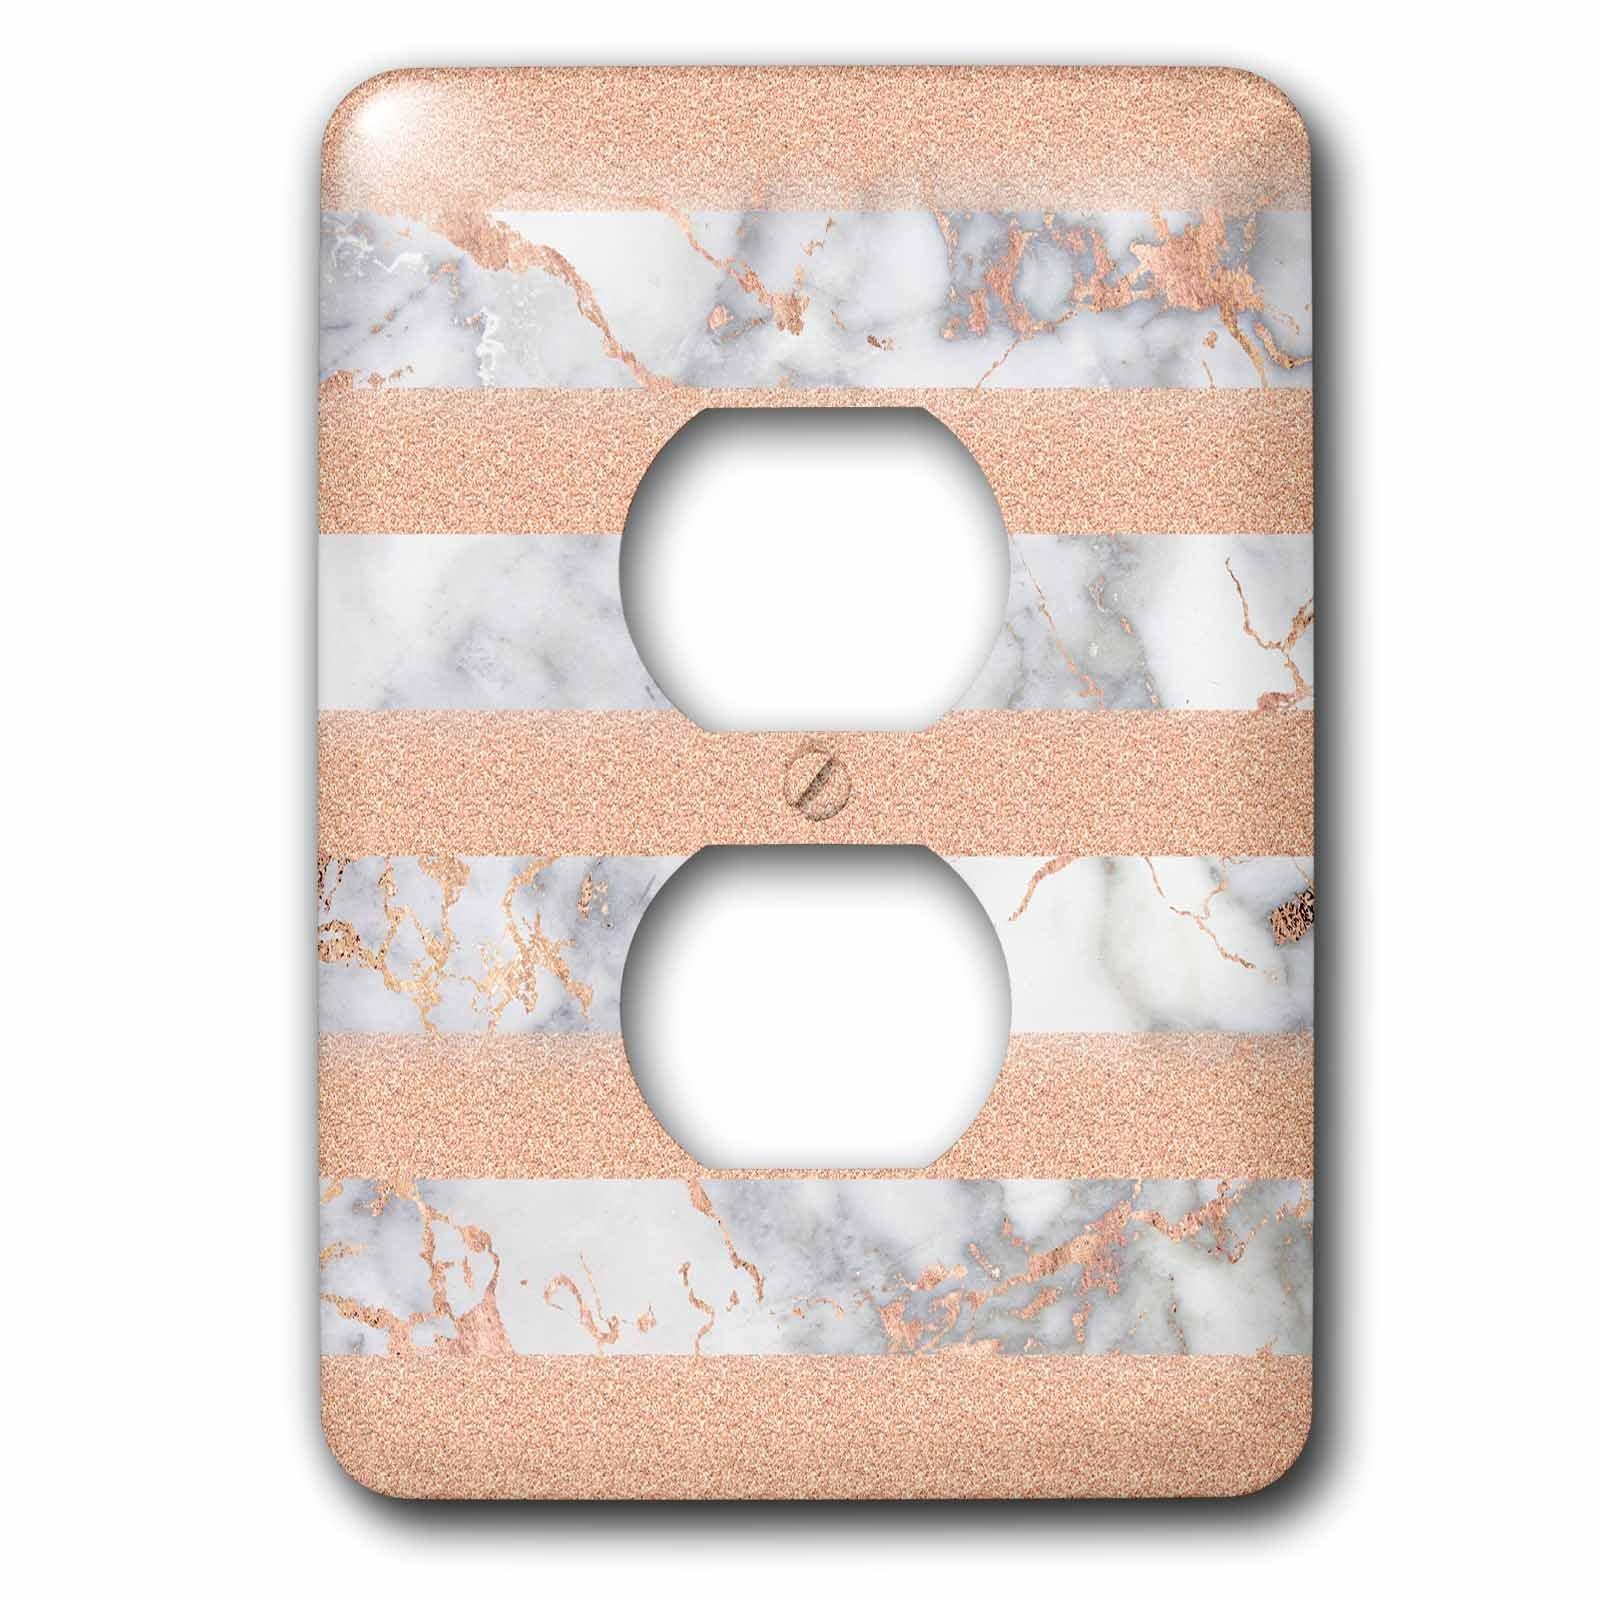 3dRose Uta Naumann Faux Glitter Pattern - Luxury Grey Copper Glitter Stripes Stone Marble Metallic Faux Print - Light Switch Covers - 2 plug outlet cover (lsp_268843_6)